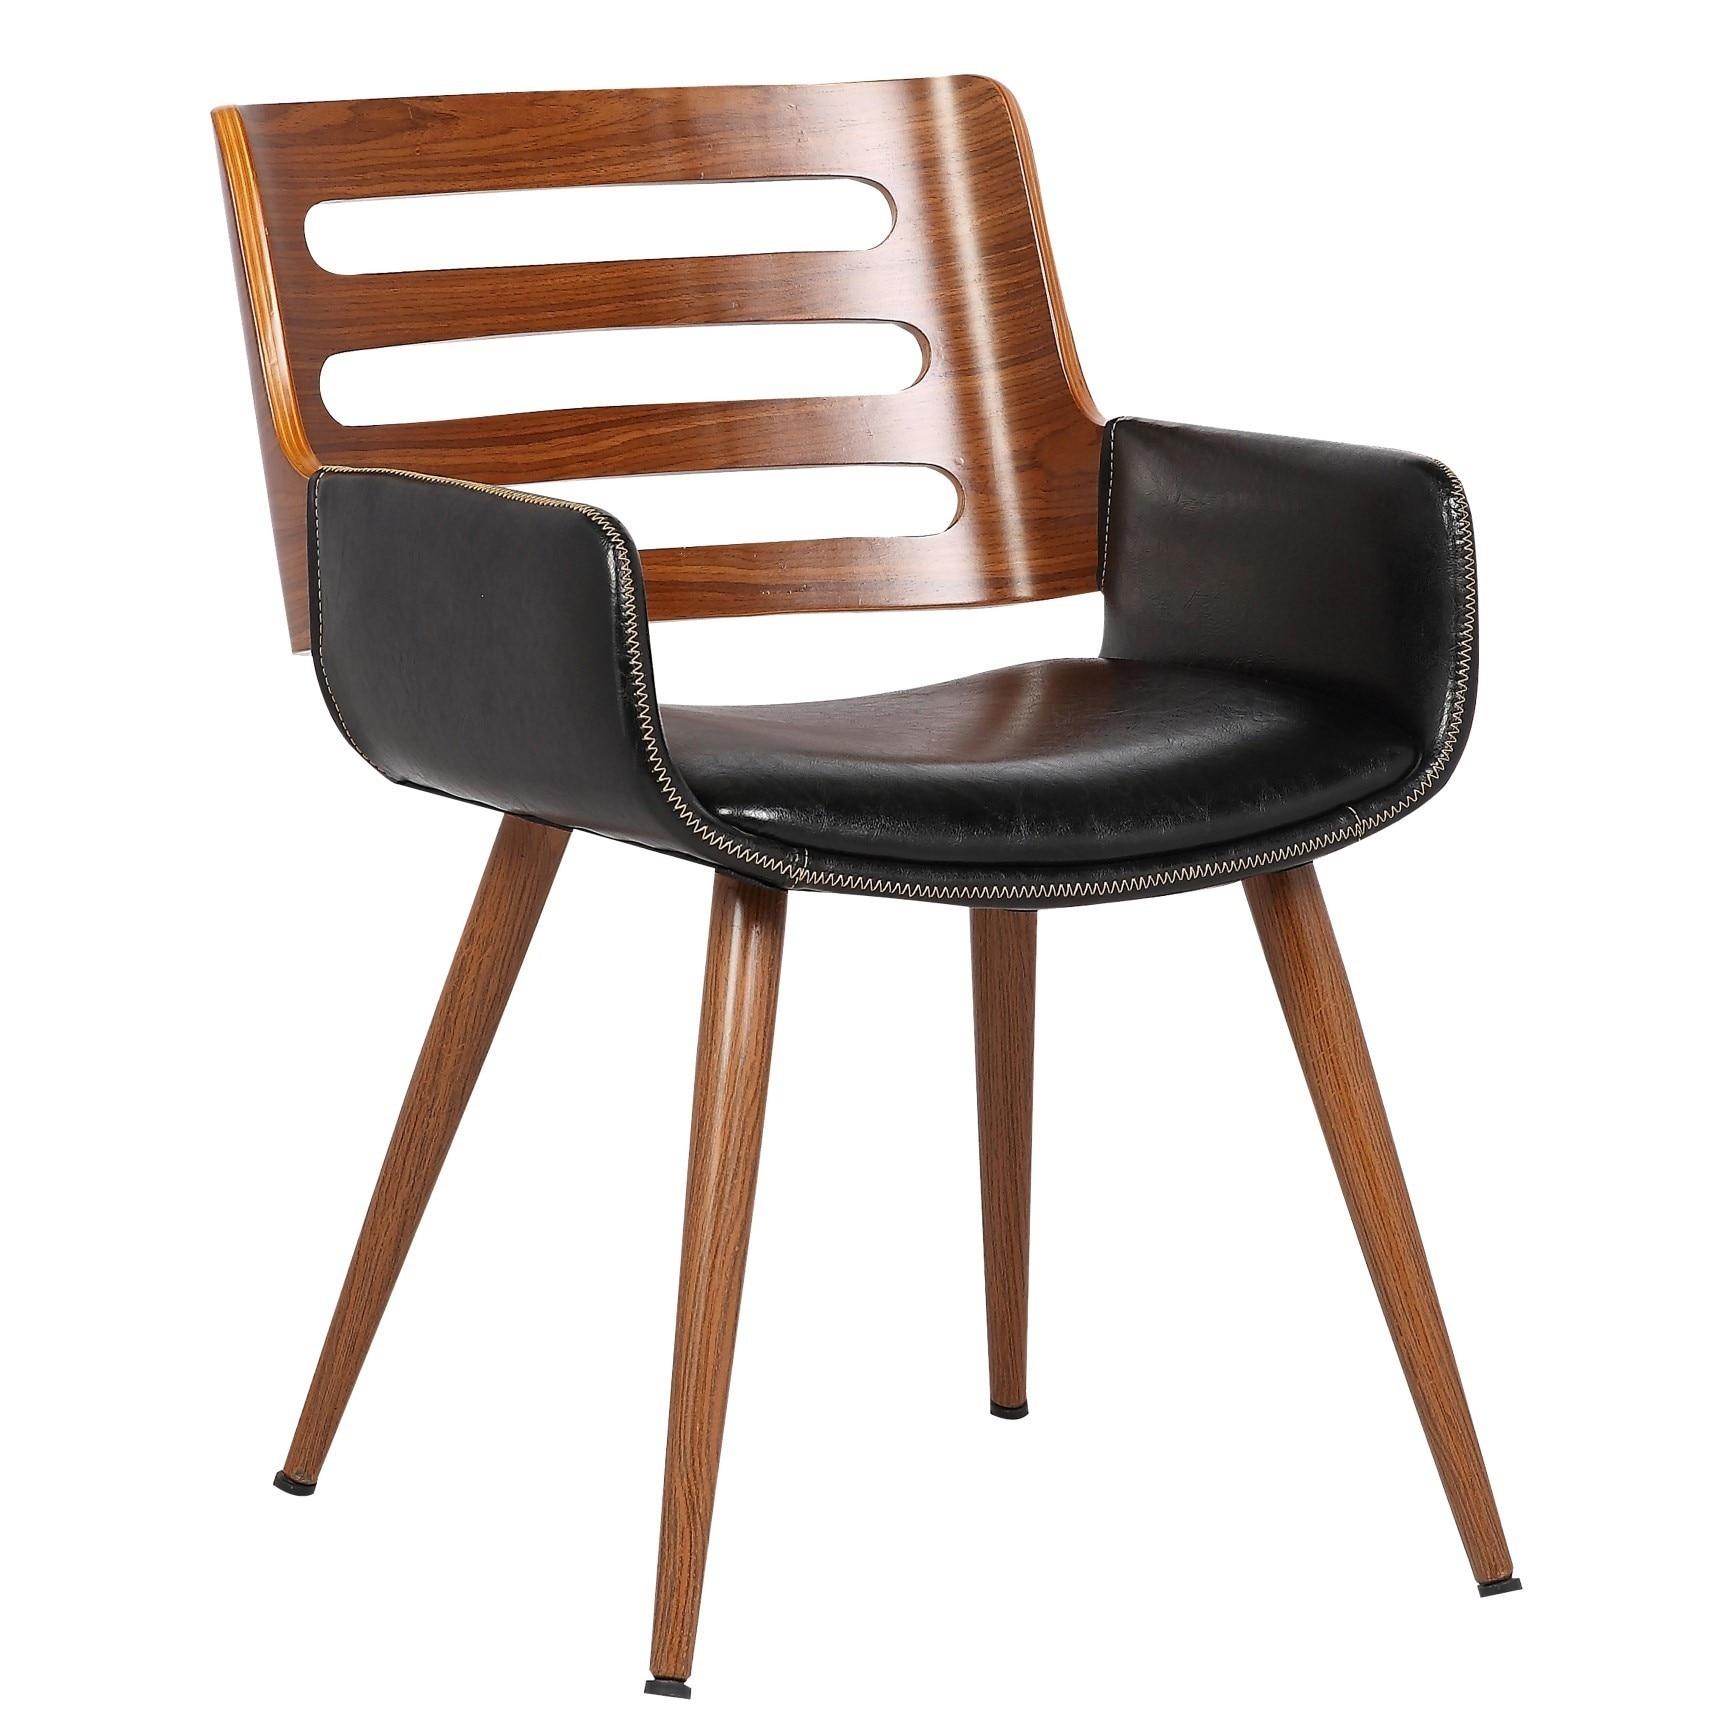 Porthos Home Olivia Dining Chair Walmartcom : 494928a6 806c 421e b207 a41ef078c6441fd4592dc0bf32dedabf7cac43a2ae983 from www.walmart.com size 560 x 560 jpeg 31kB